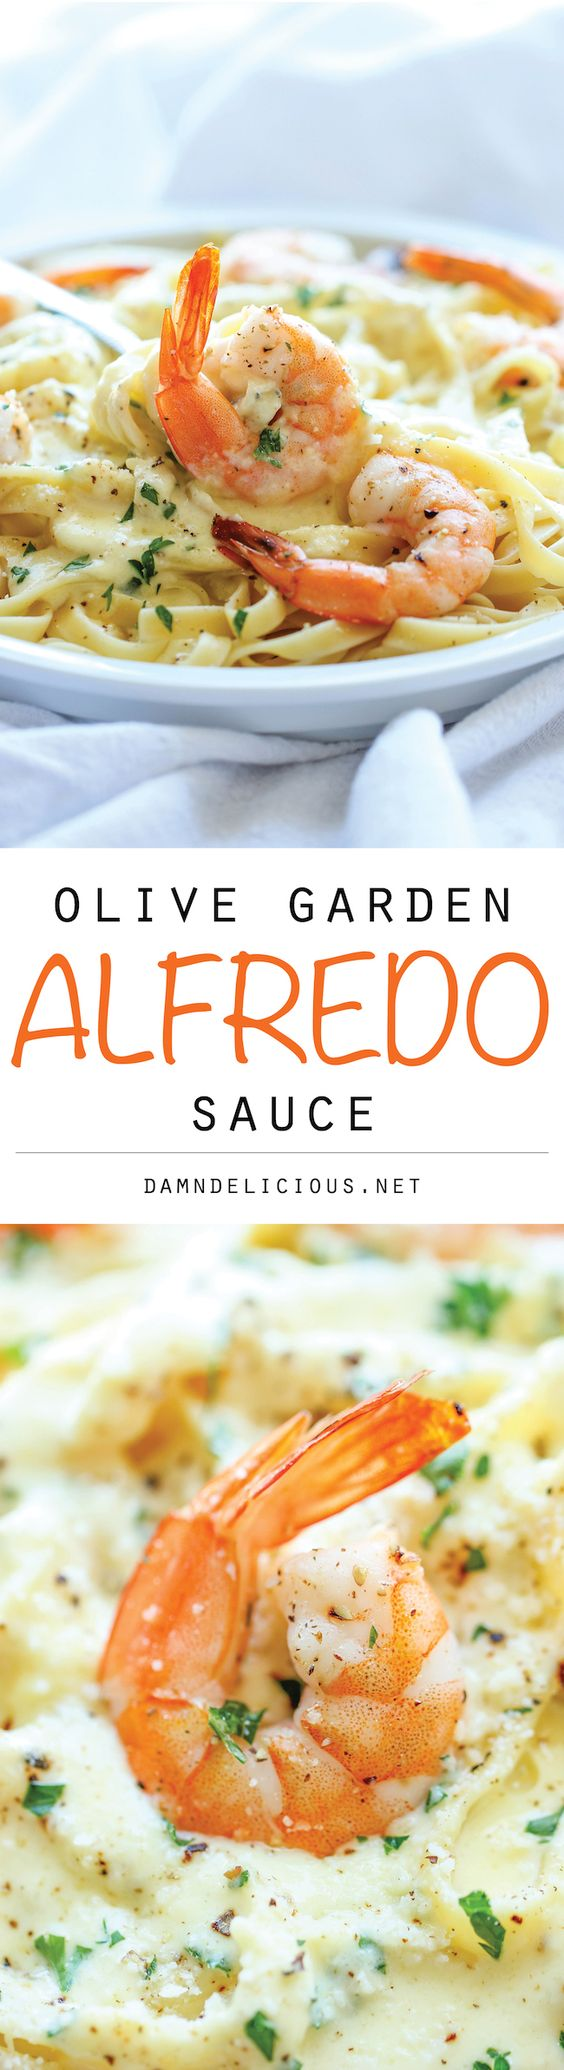 Olive garden alfredo sauce recipe gardens sauces and - Olive garden chicken alfredo sauce recipe ...